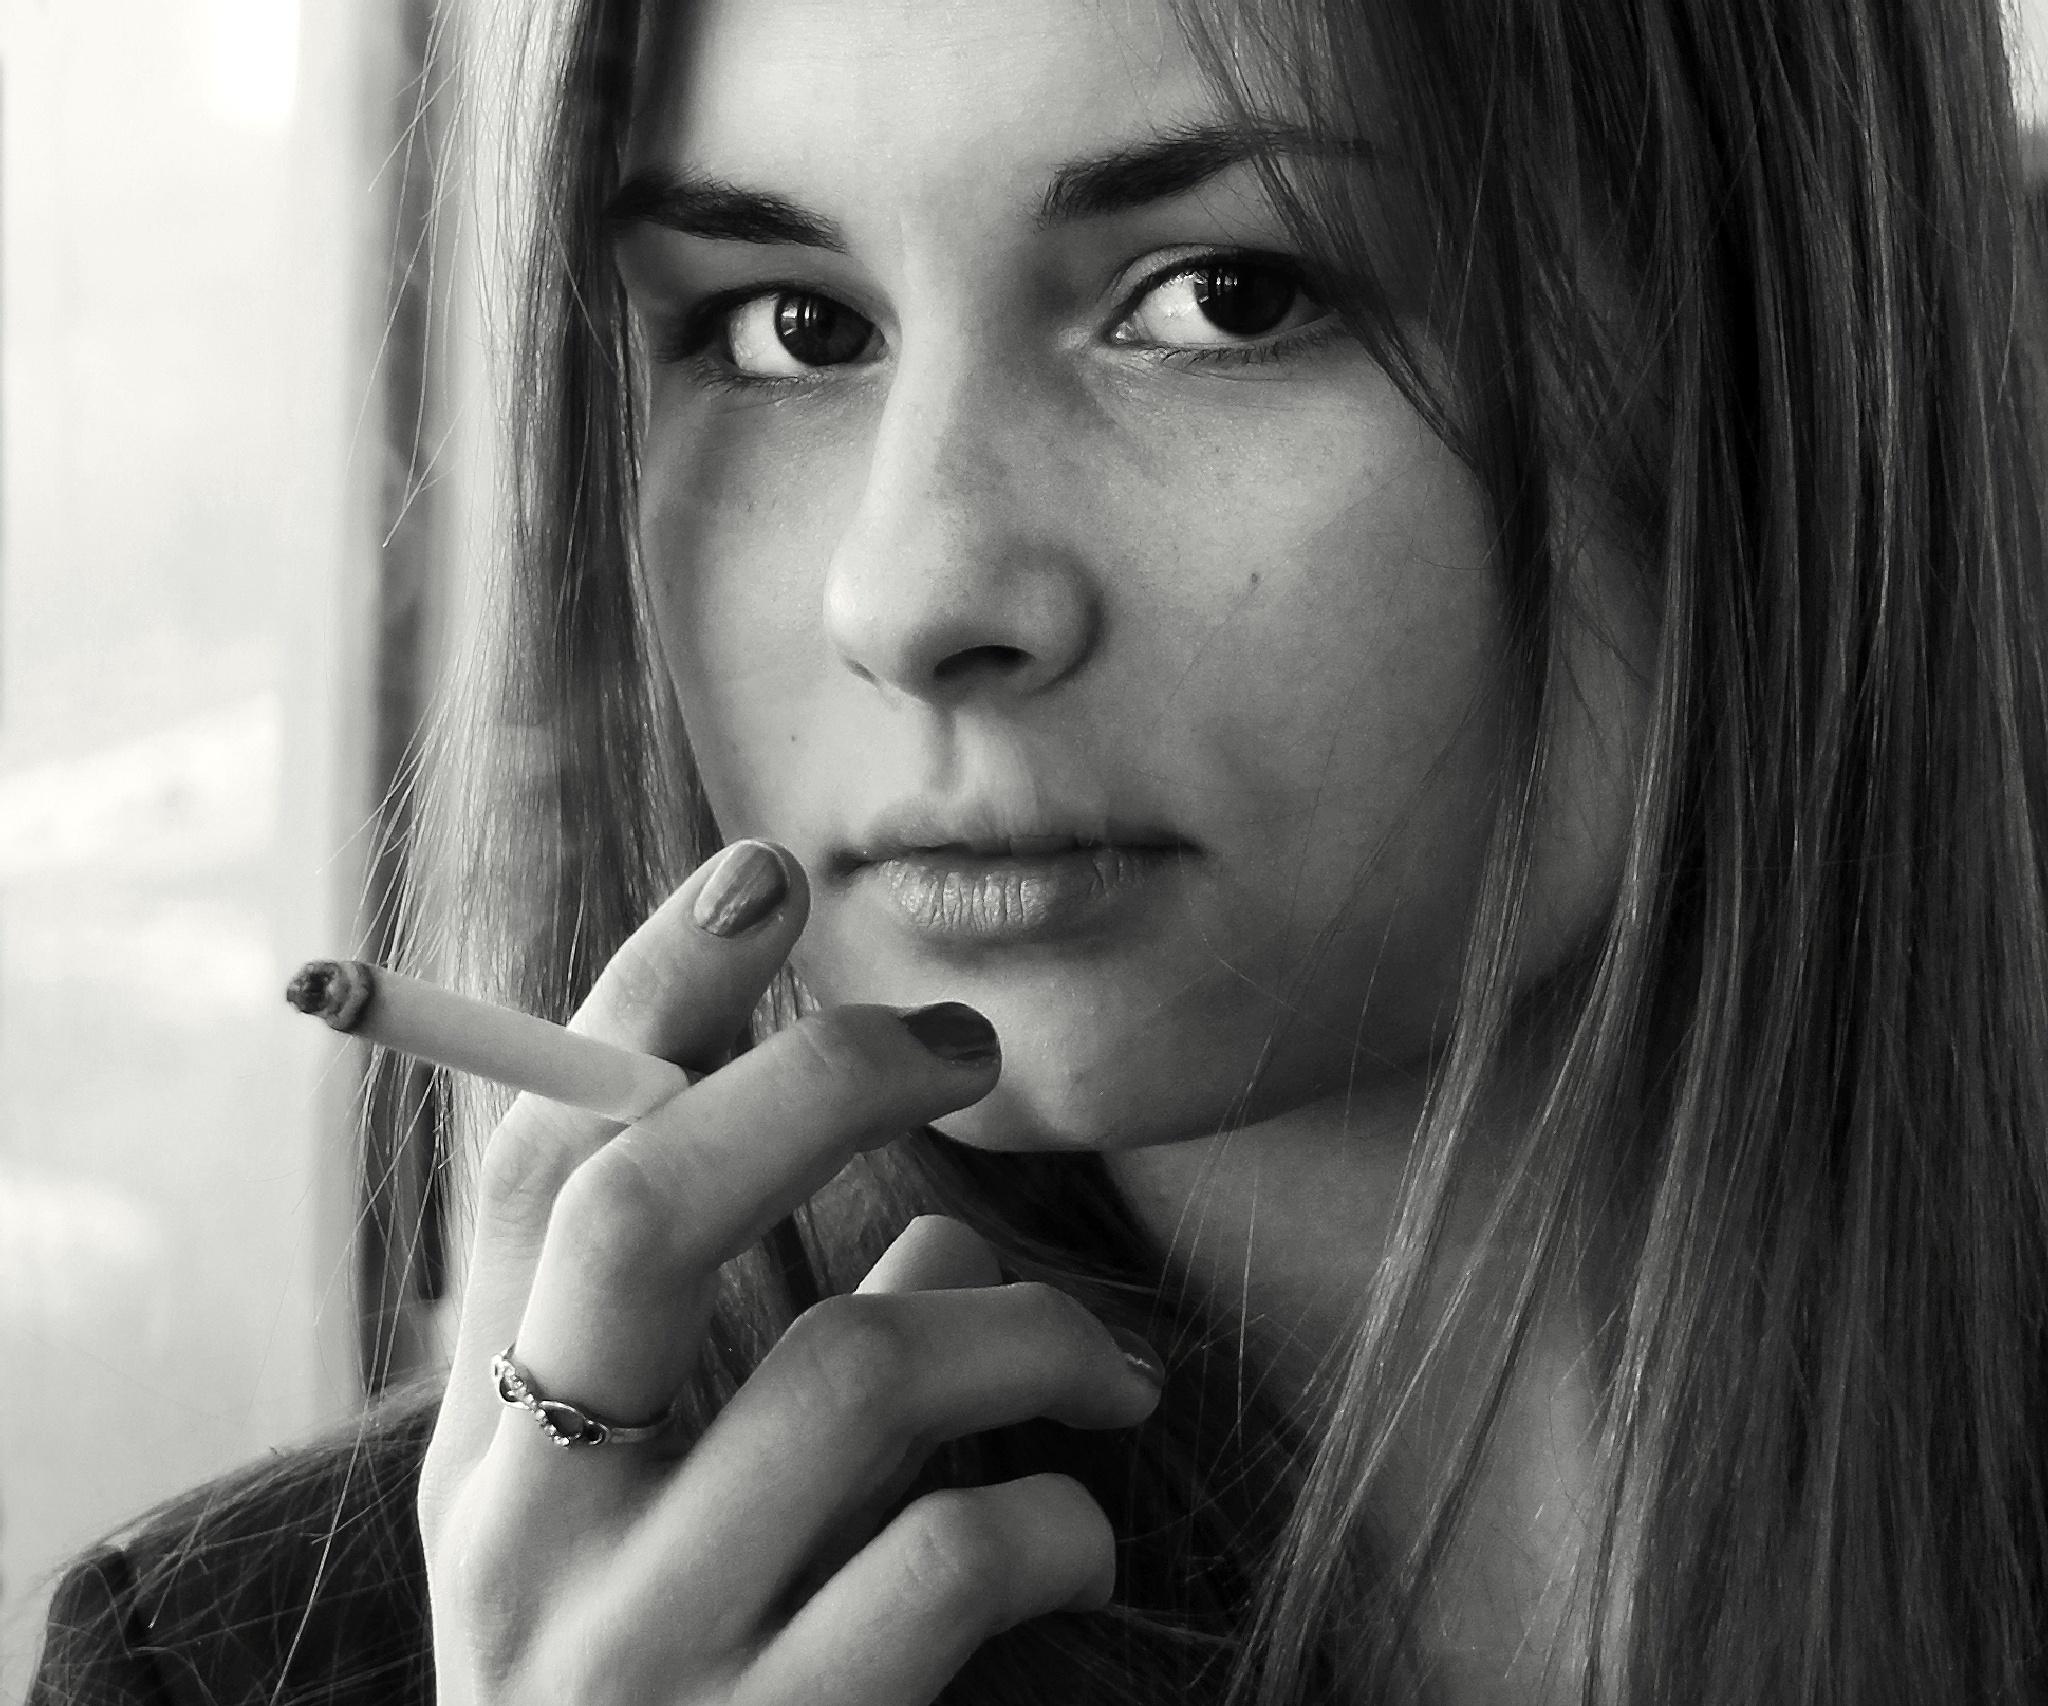 Yuliya by Сергей Юрьев